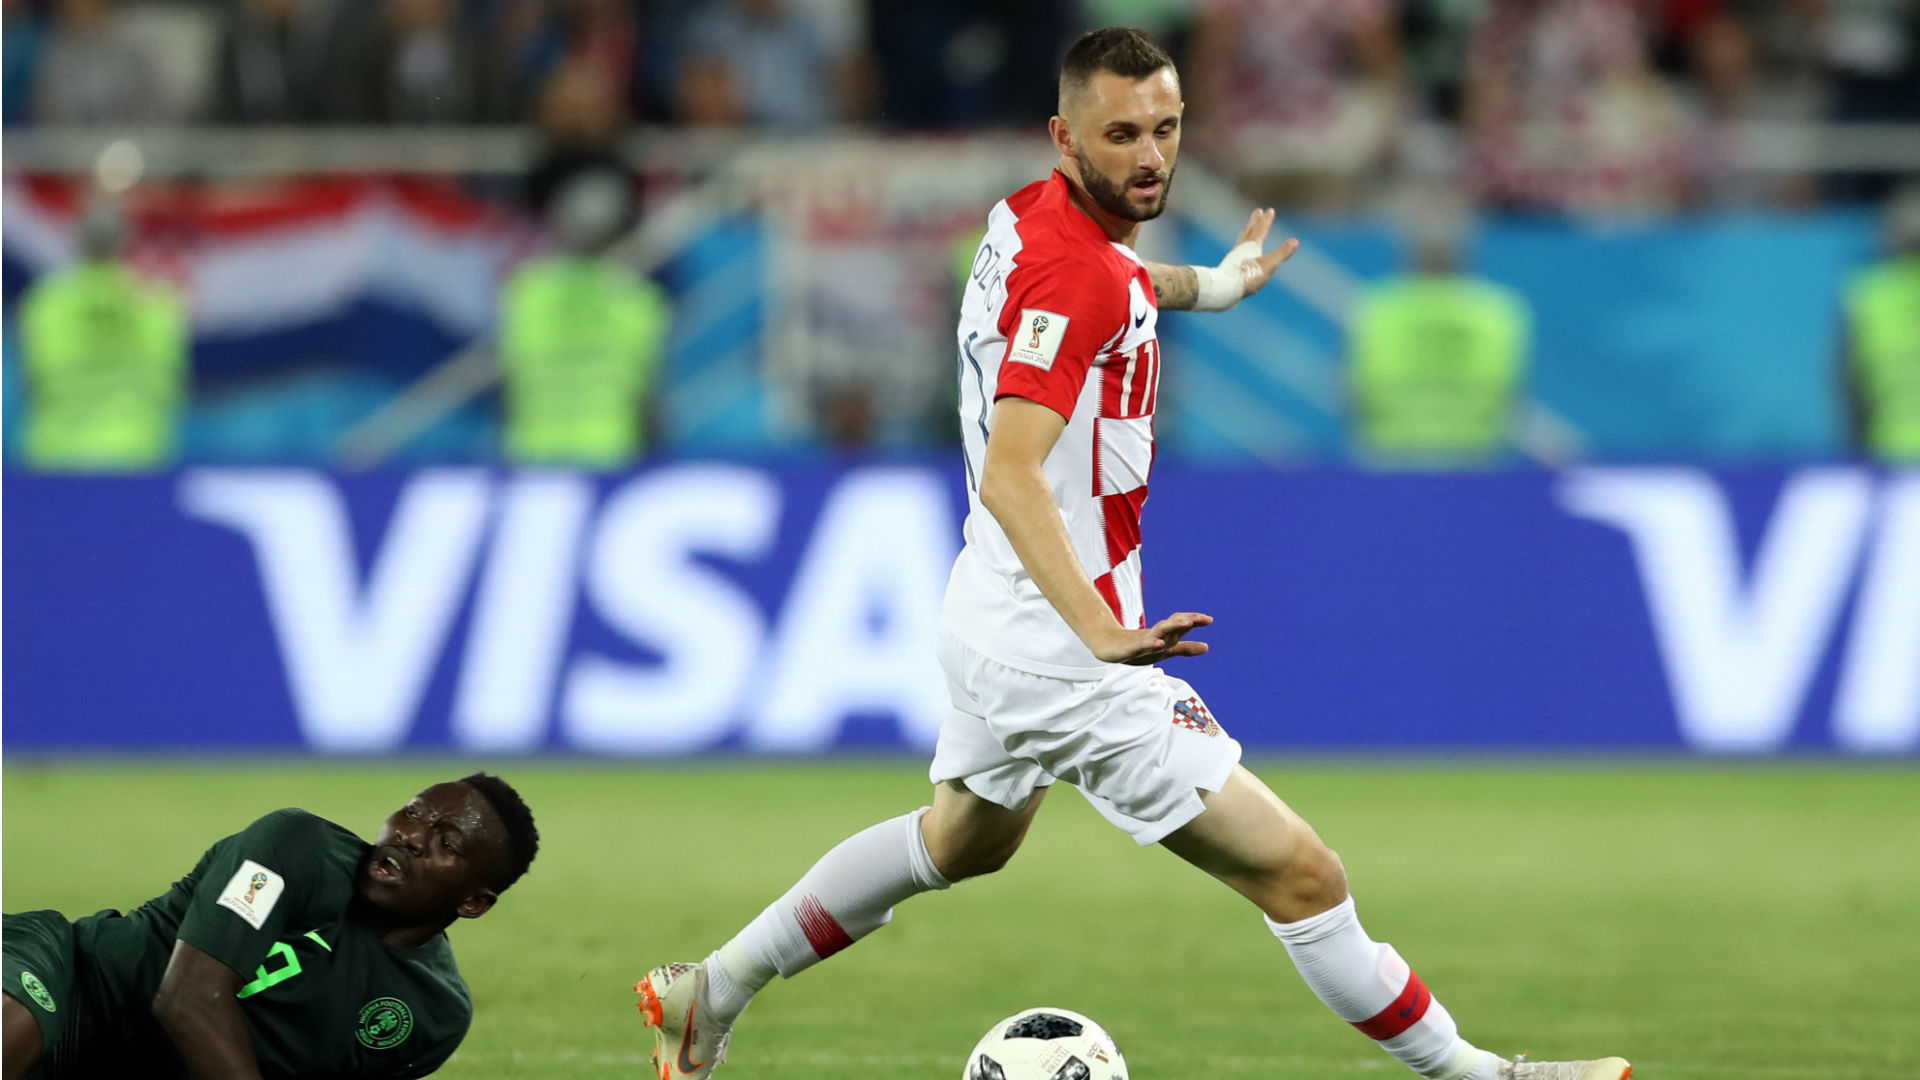 Croatia Nigeria World Cup 2018 Brozovic